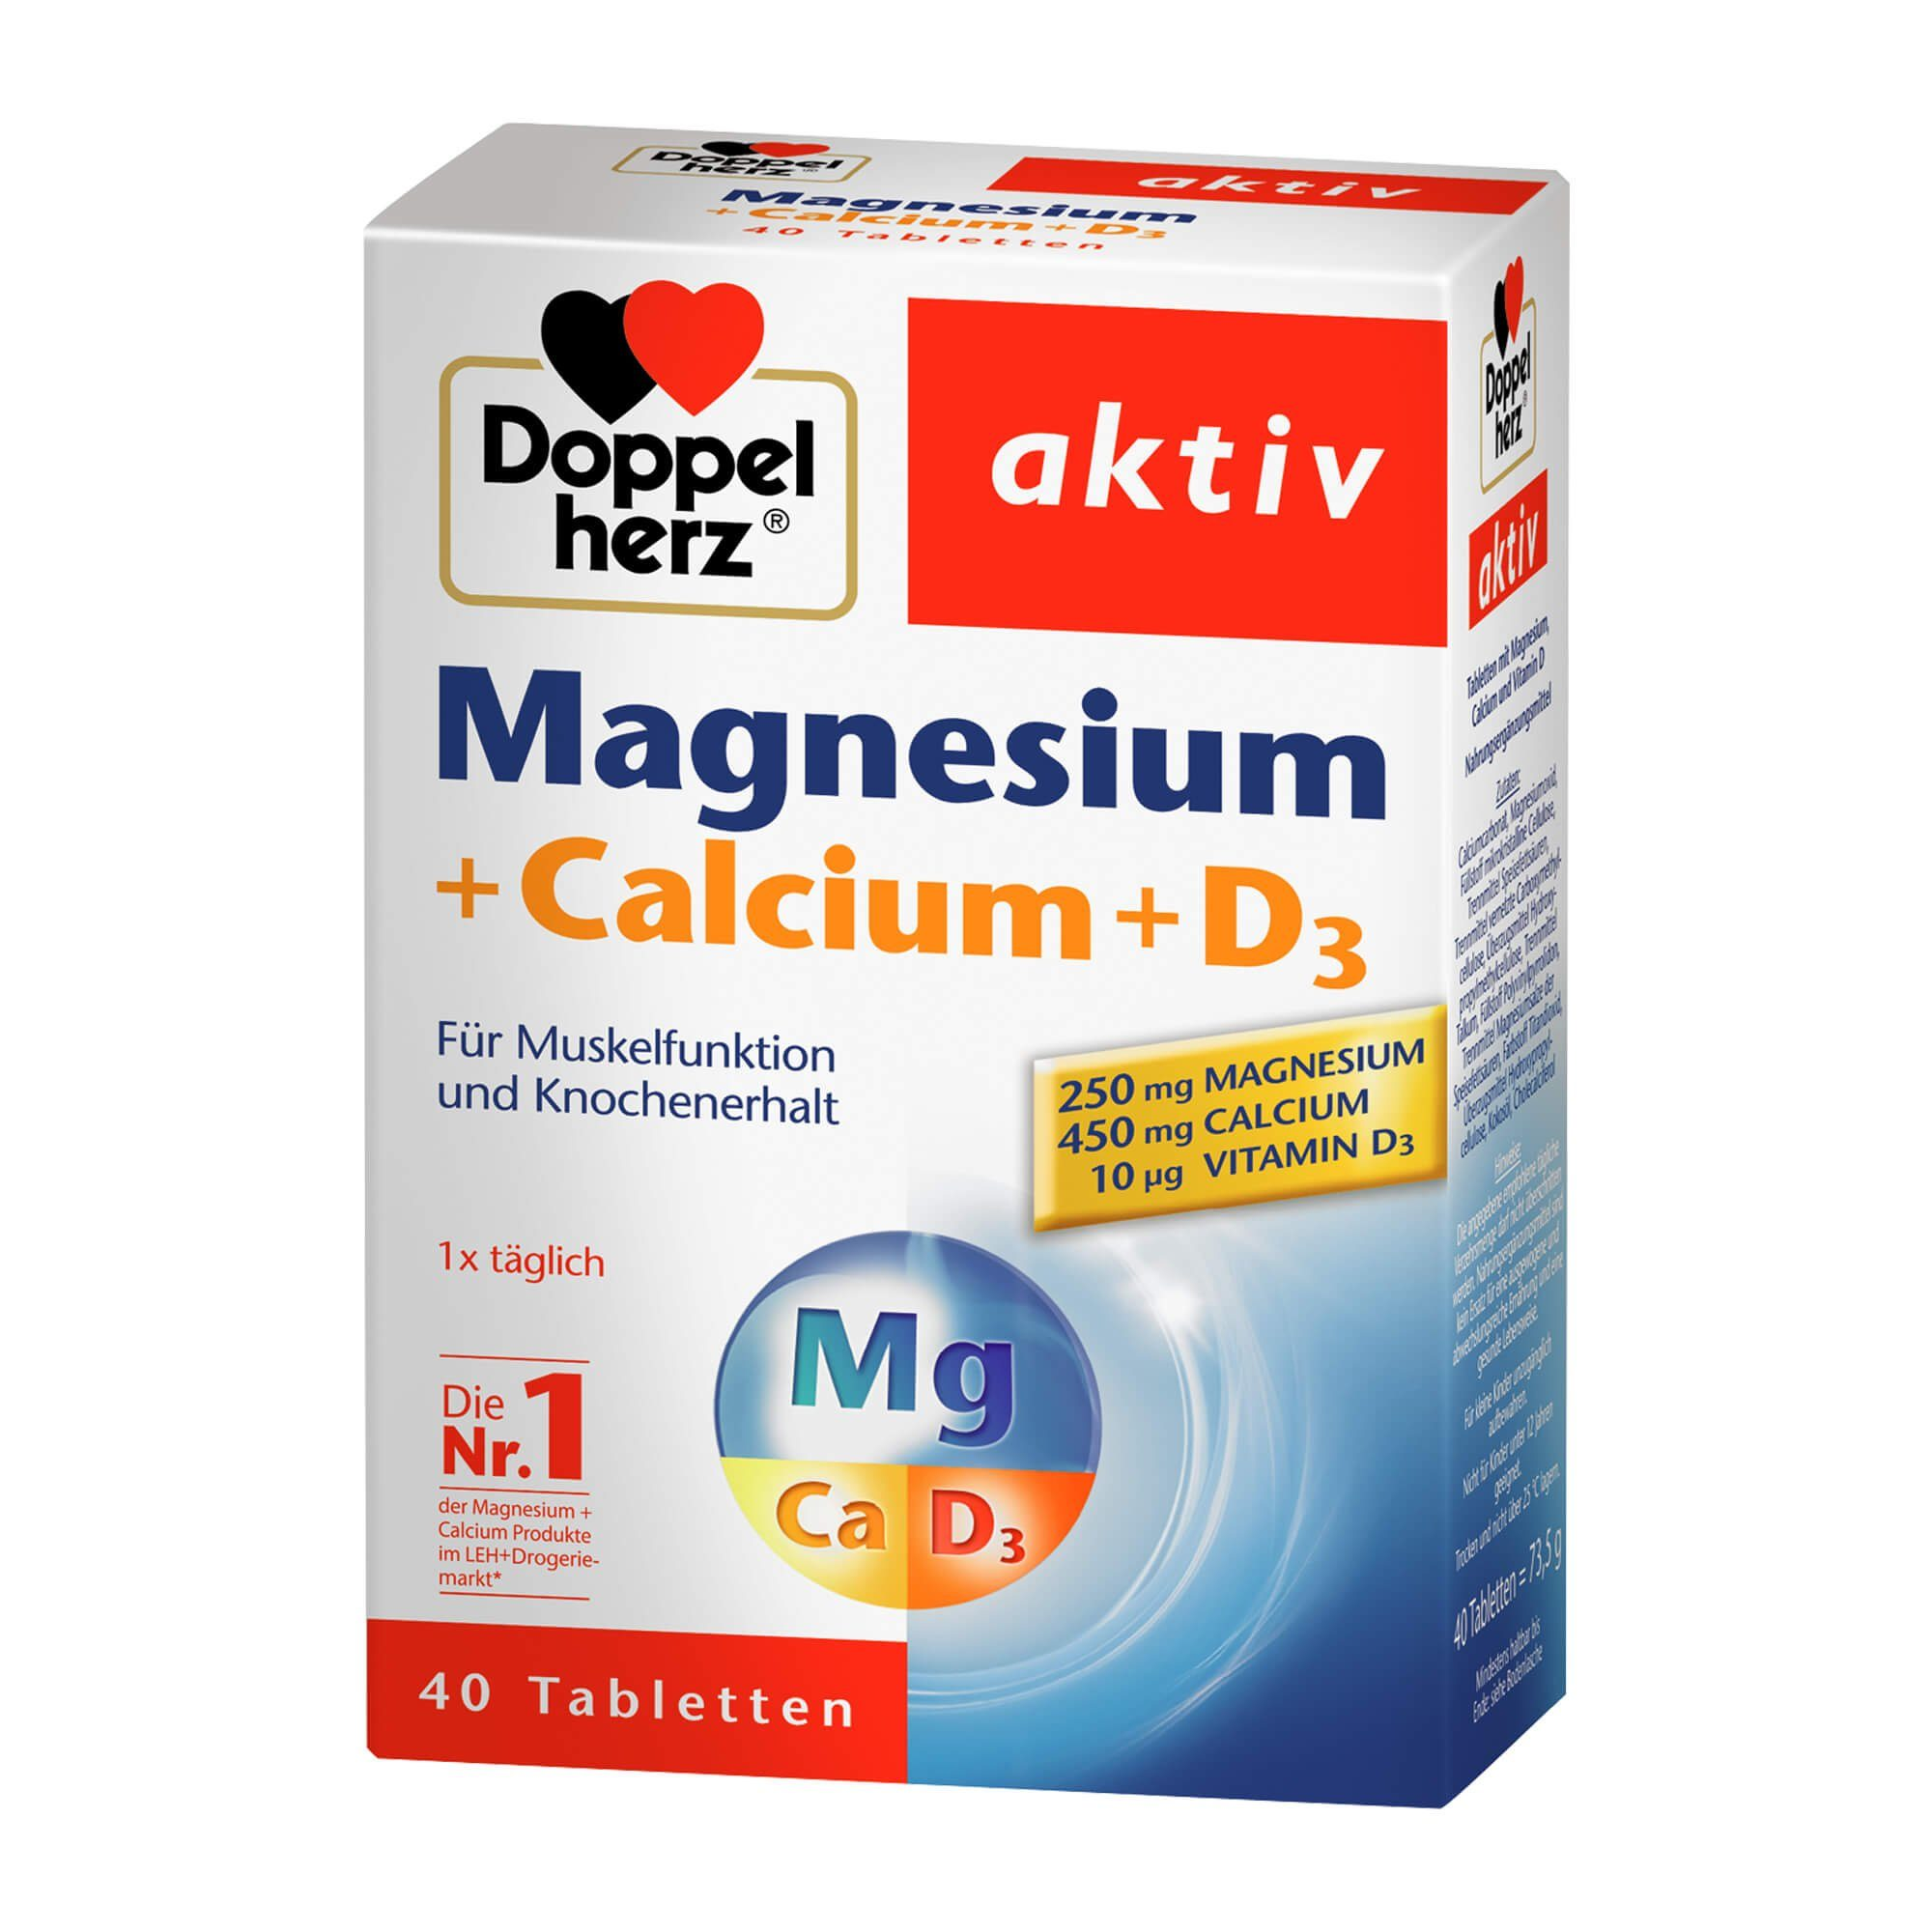 Doppelherz Doppelherz Magnesium + Calcium + D3 aktiv , 40 St